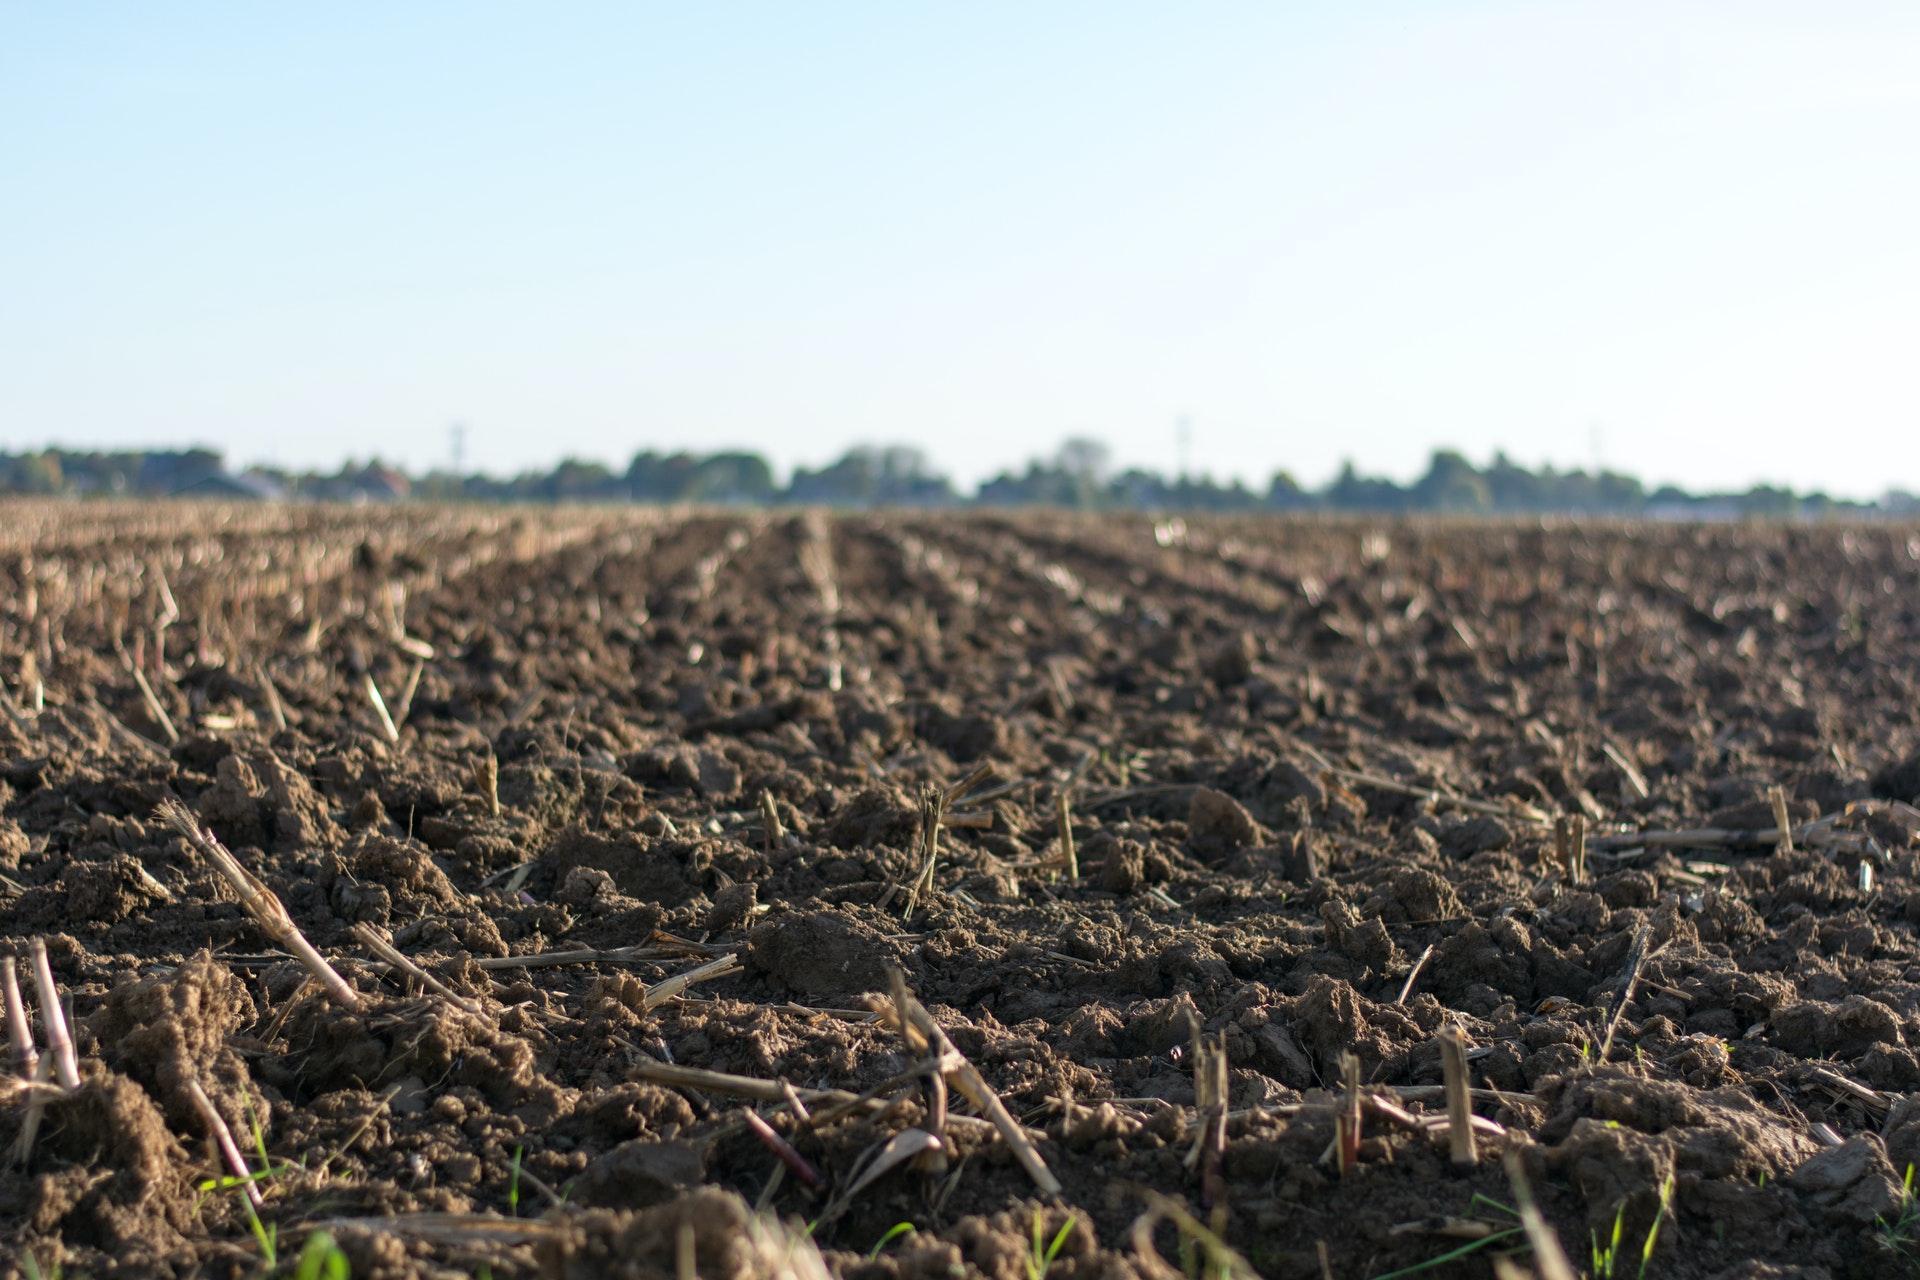 soil on ground eye level